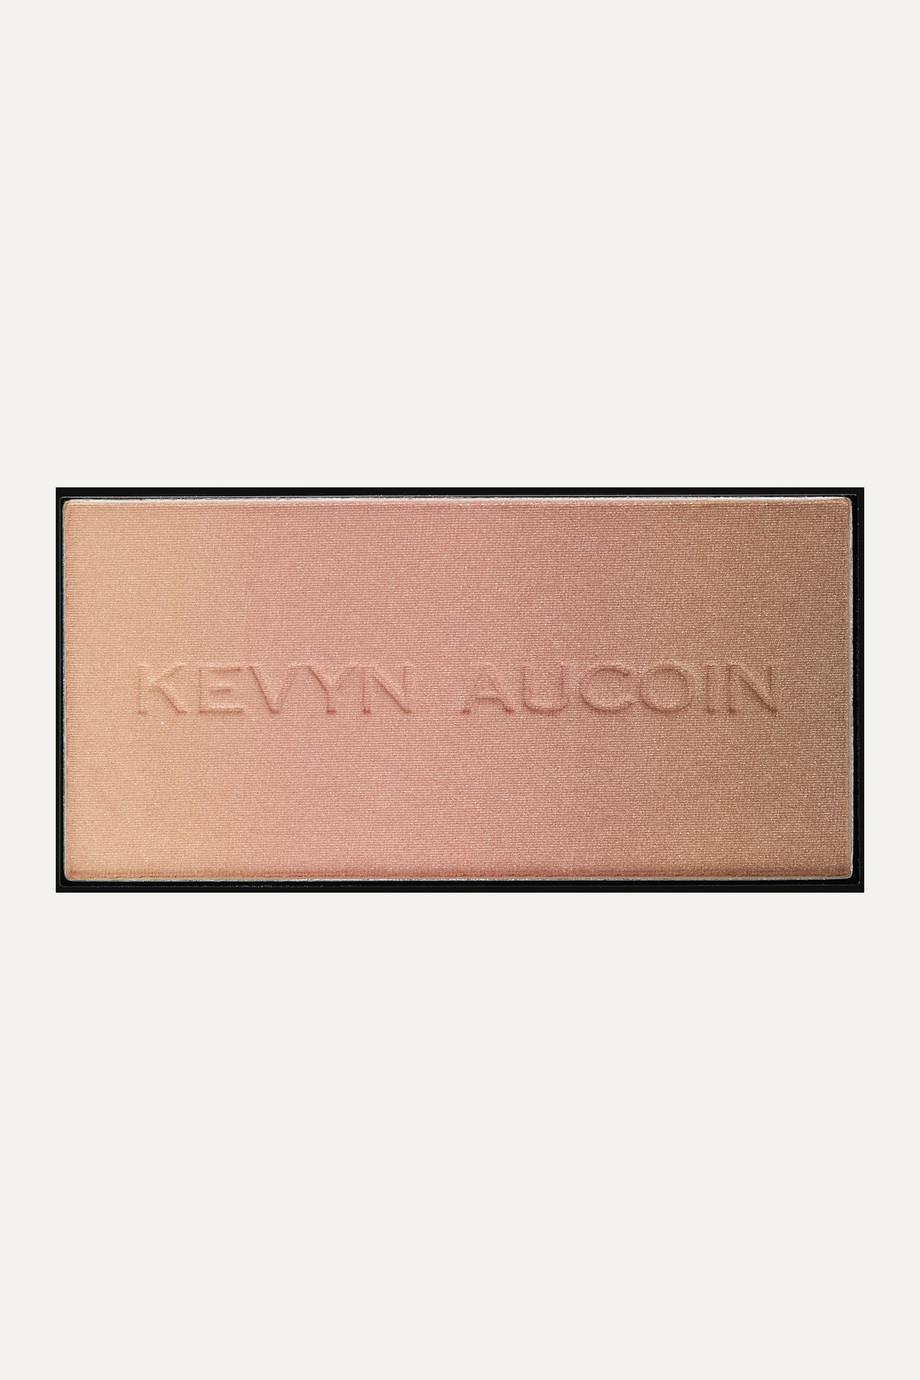 Kevyn Aucoin The Neo Highlighter – Sahara – Highlighter